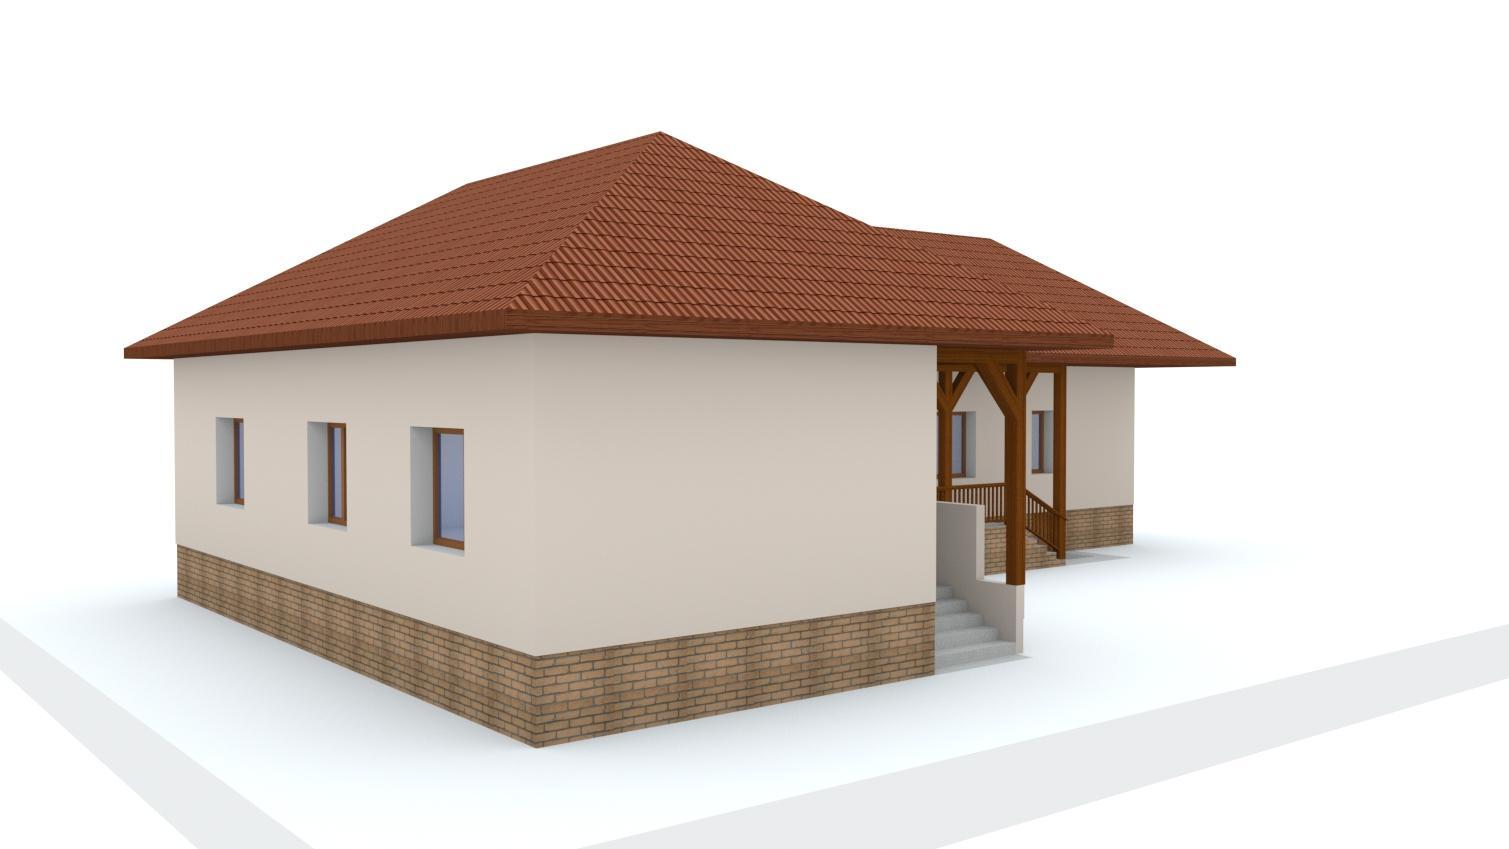 Návrh fasády rodinného domu - Obrázok č. 1